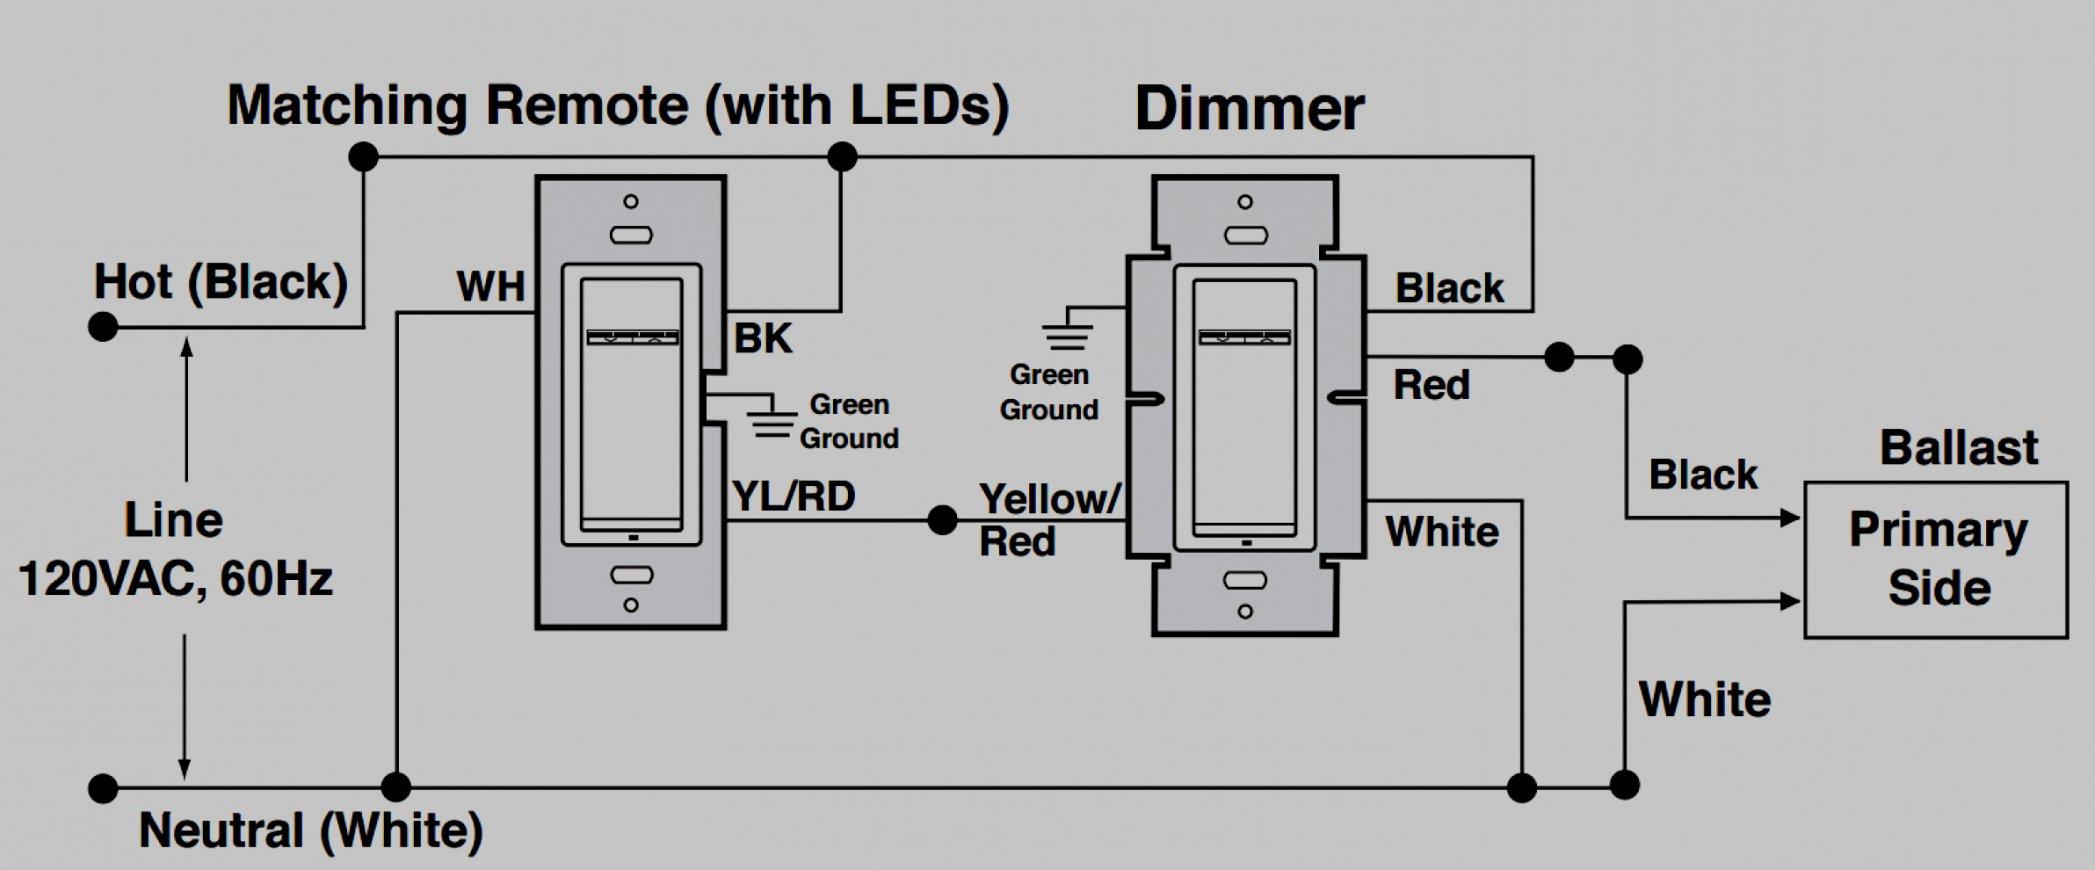 S2L Lutron Dimmer Switch Wiring Diagram   Wiring Diagram - Lutron 3 Way Dimmer Wiring Diagram